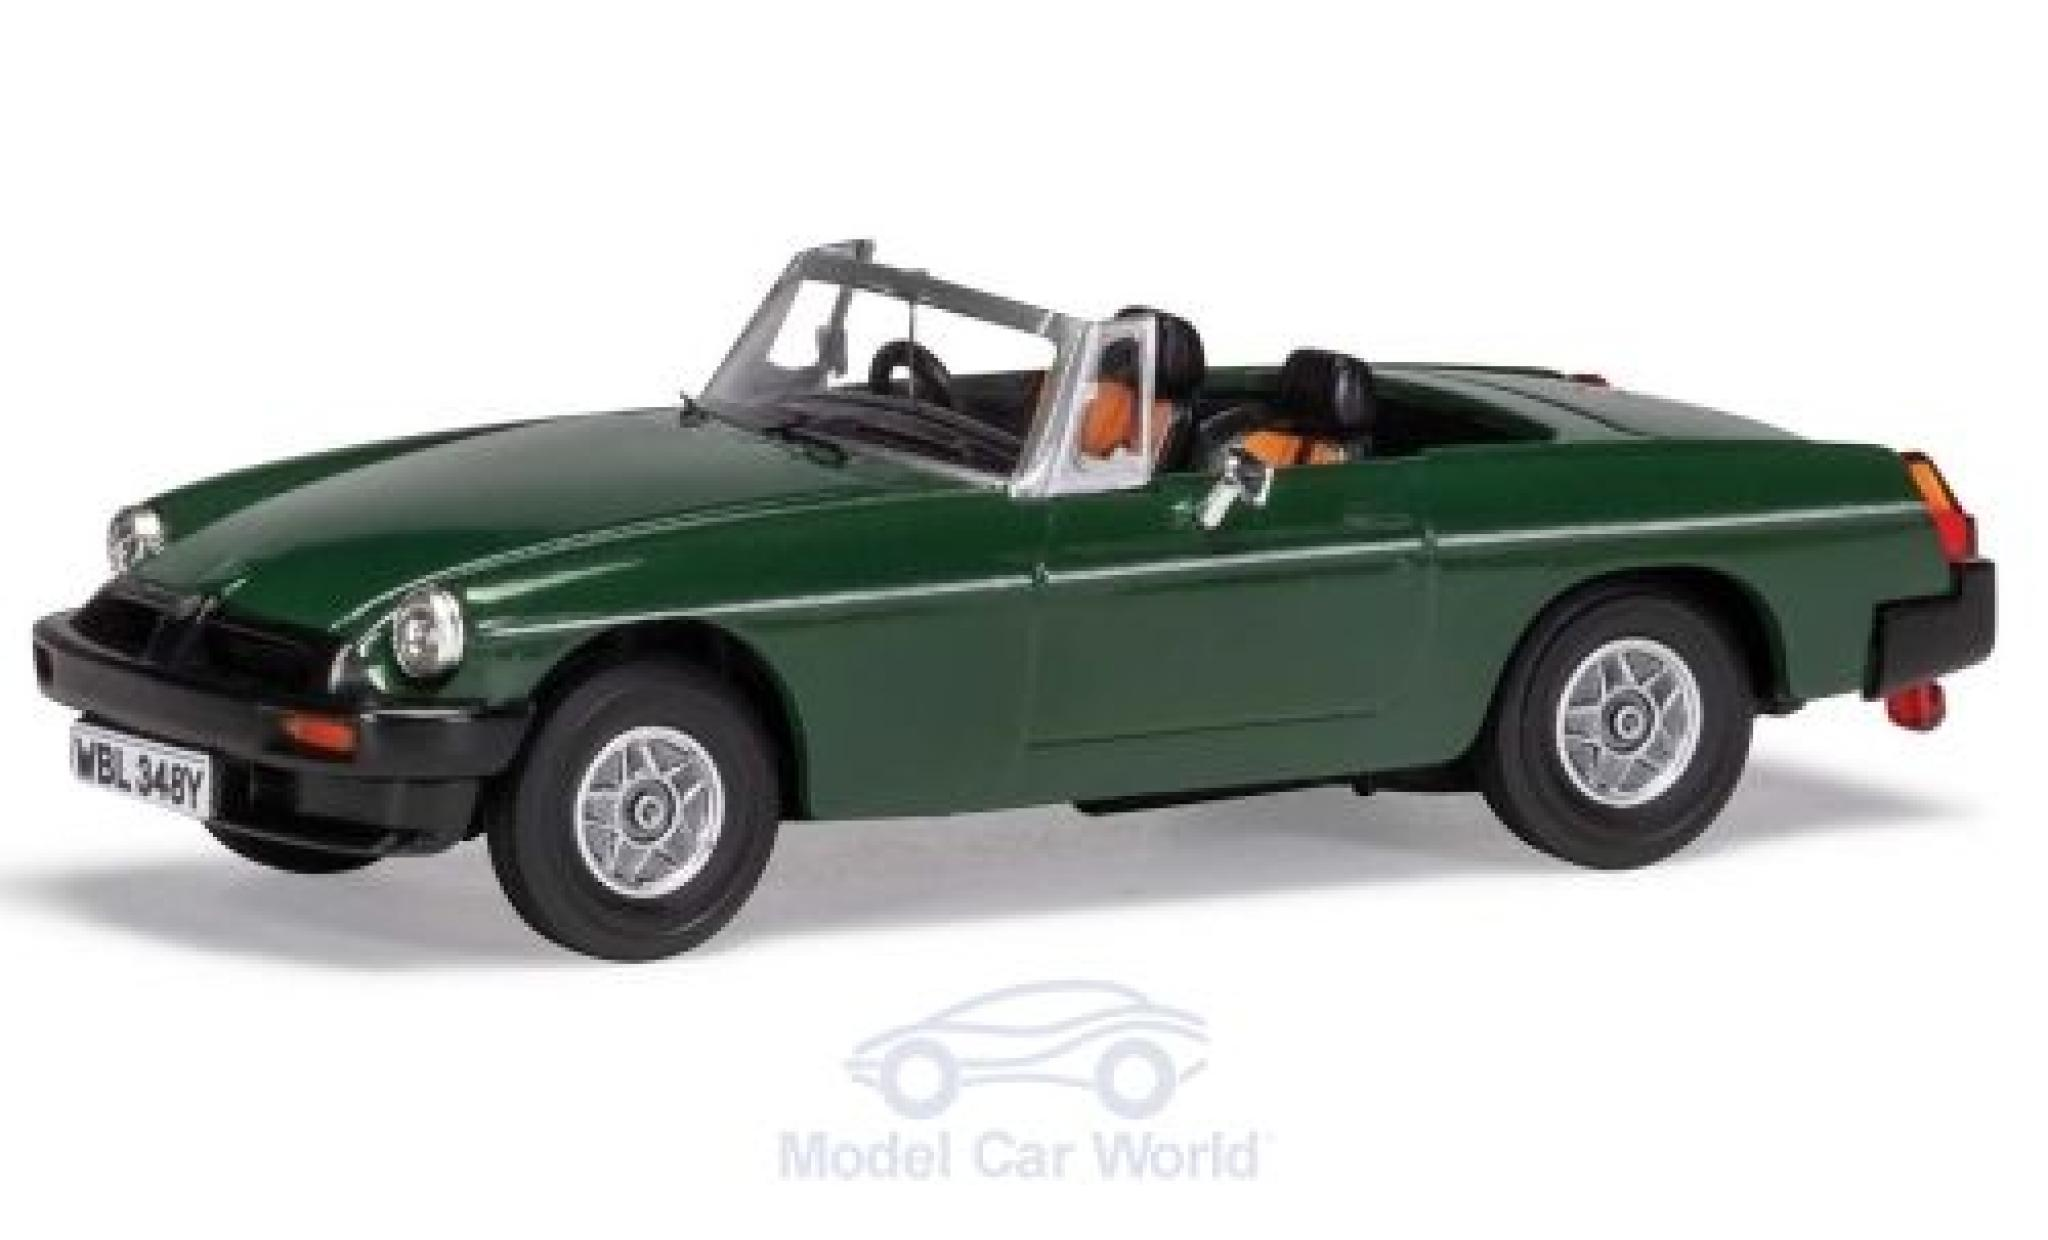 MG B 1/43 Vanguards Roadster V8 green RHD Don Hayters car